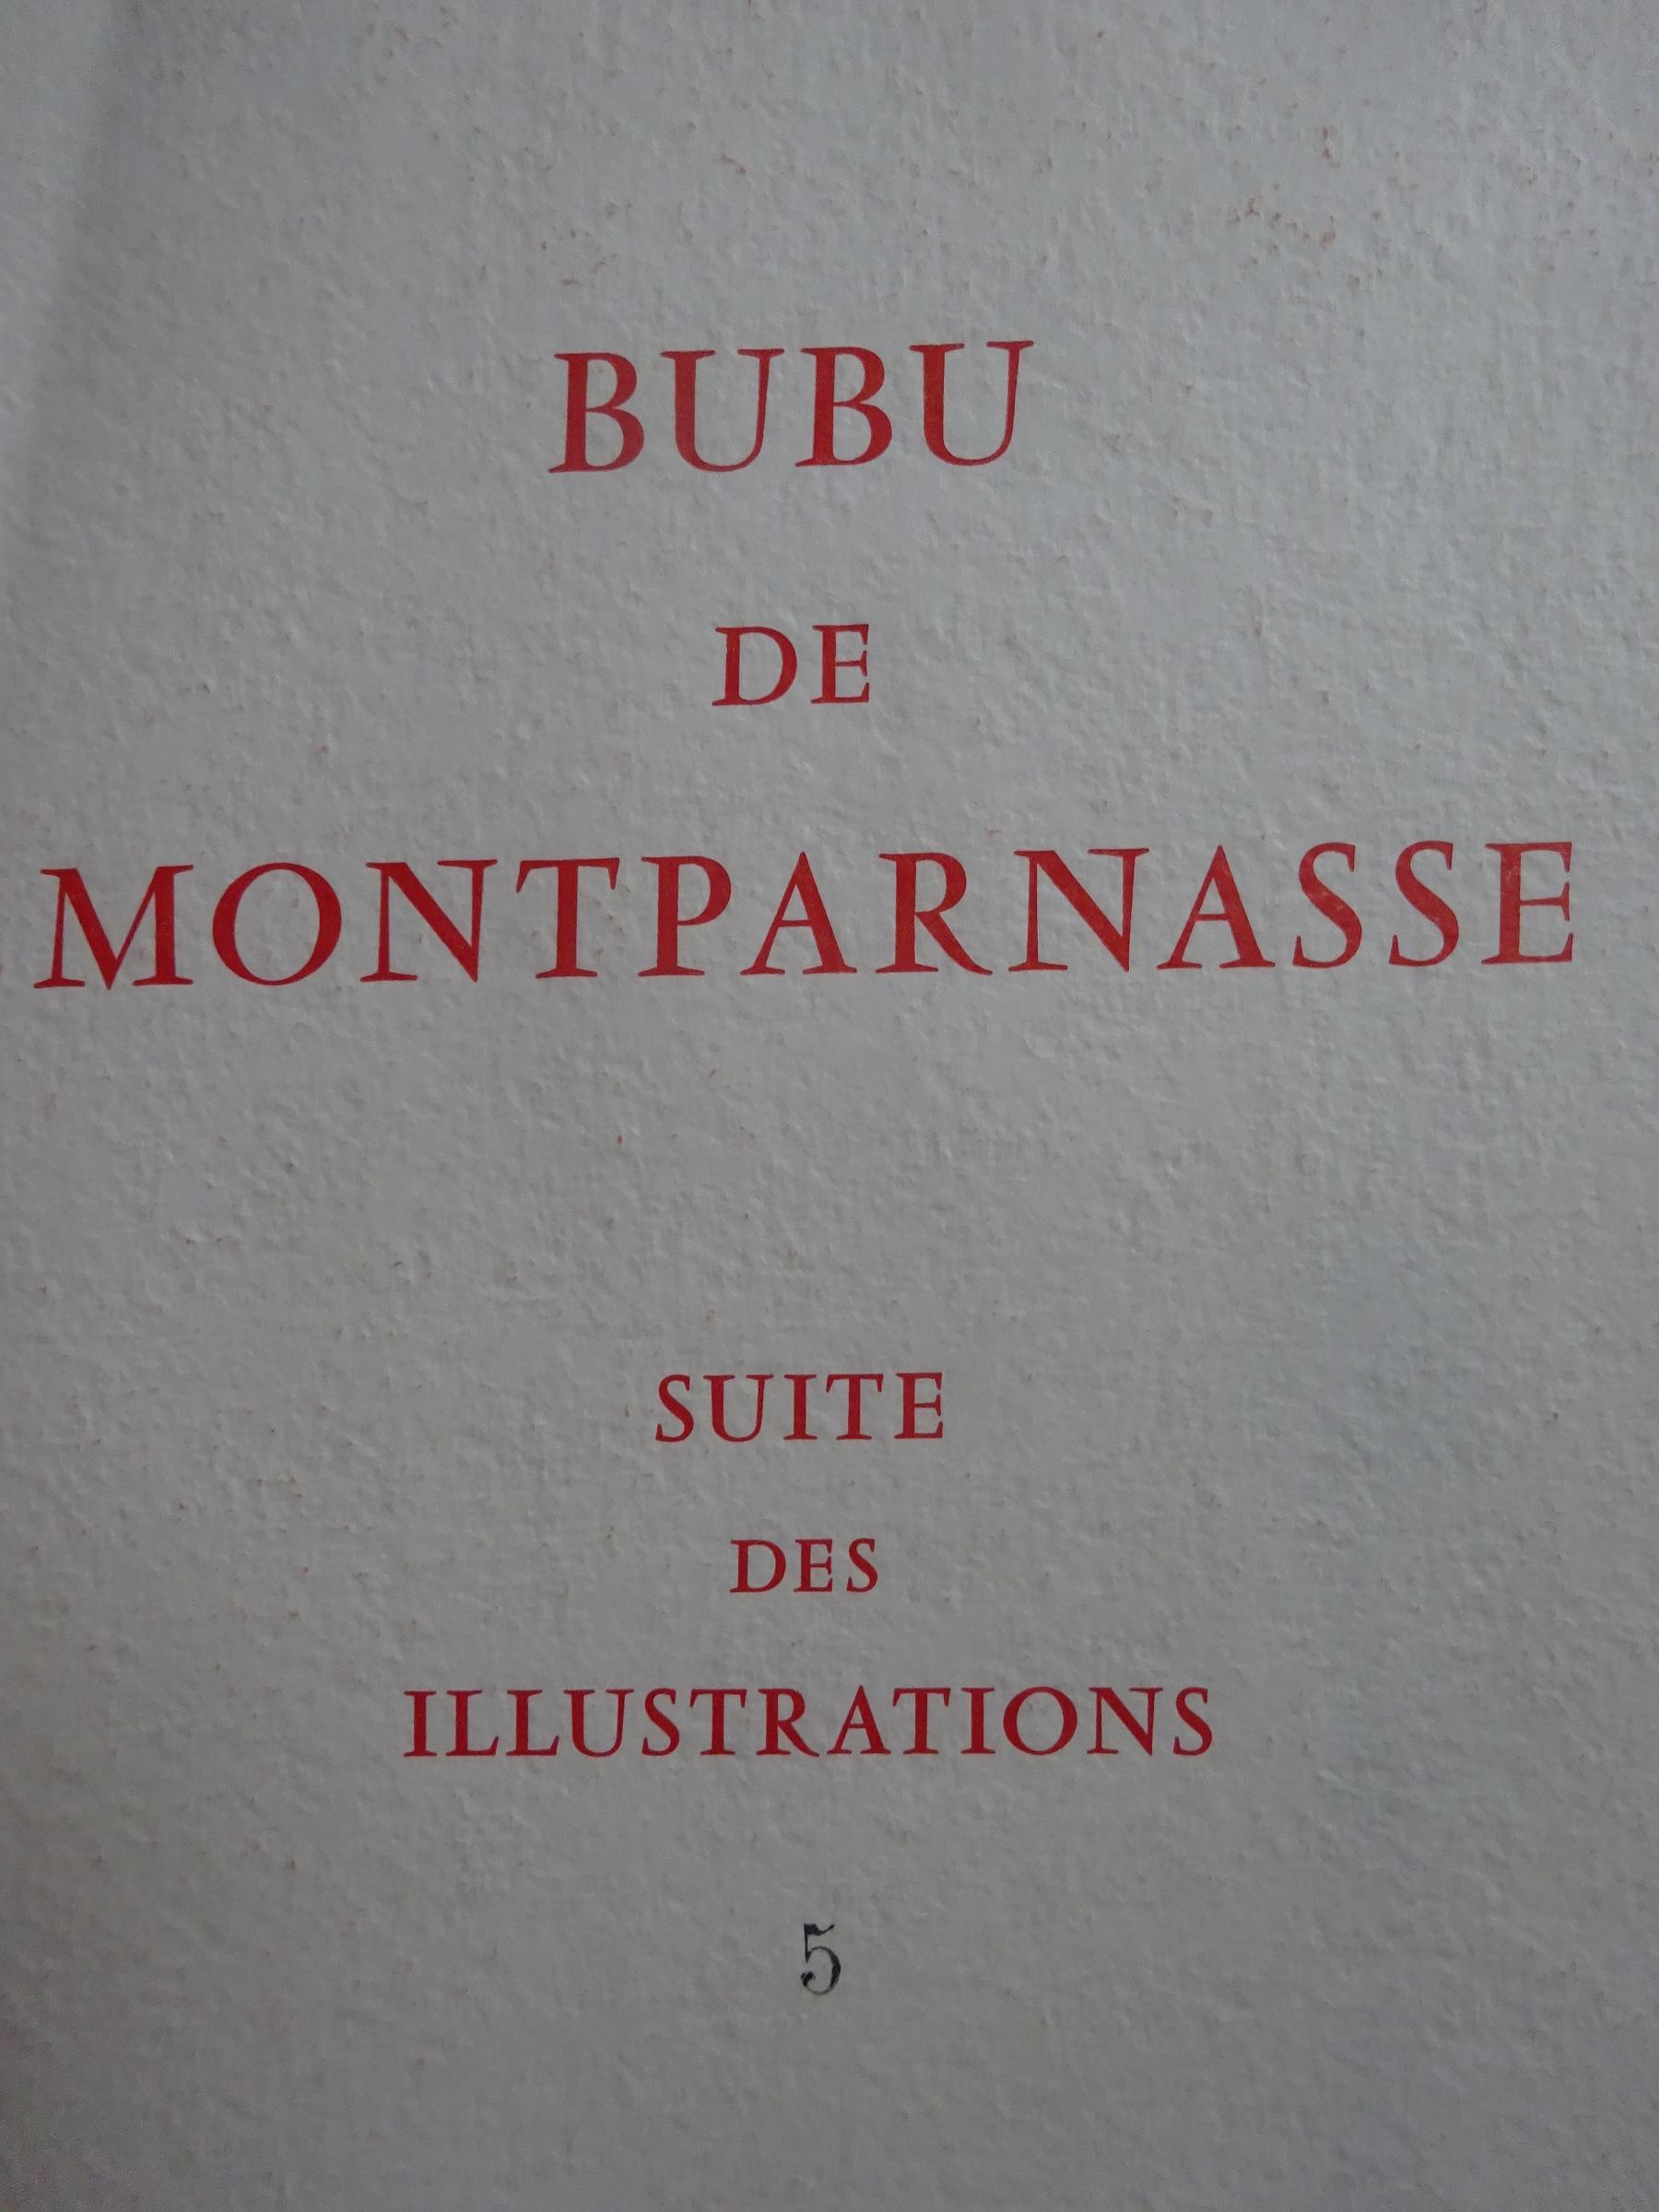 Bubu de Montparnasse 1958